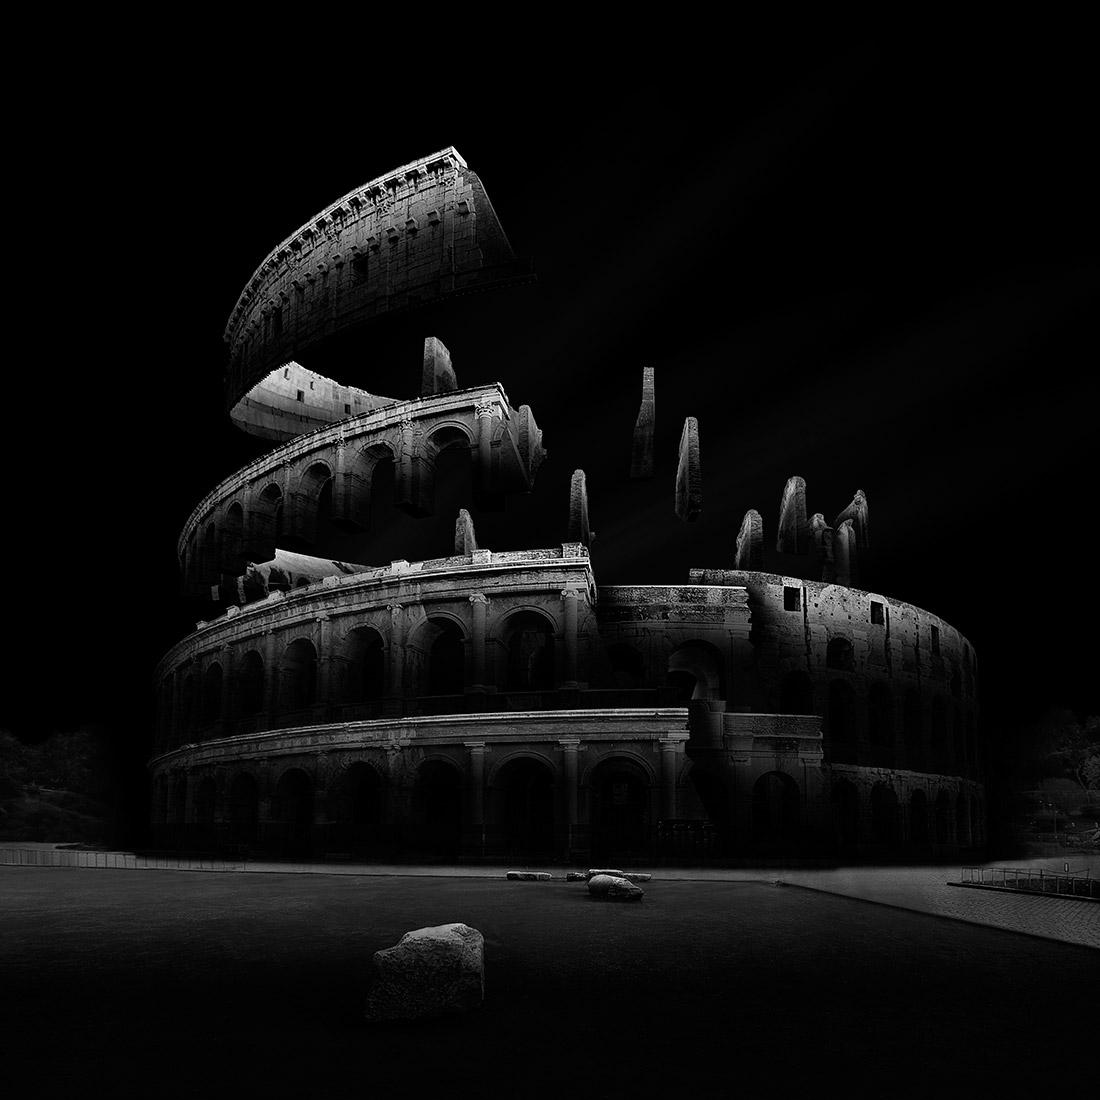 GRVTY2, © Daniel Garay Arango, Black & White Series of the Year 2018, MonoVisions Photography Awards